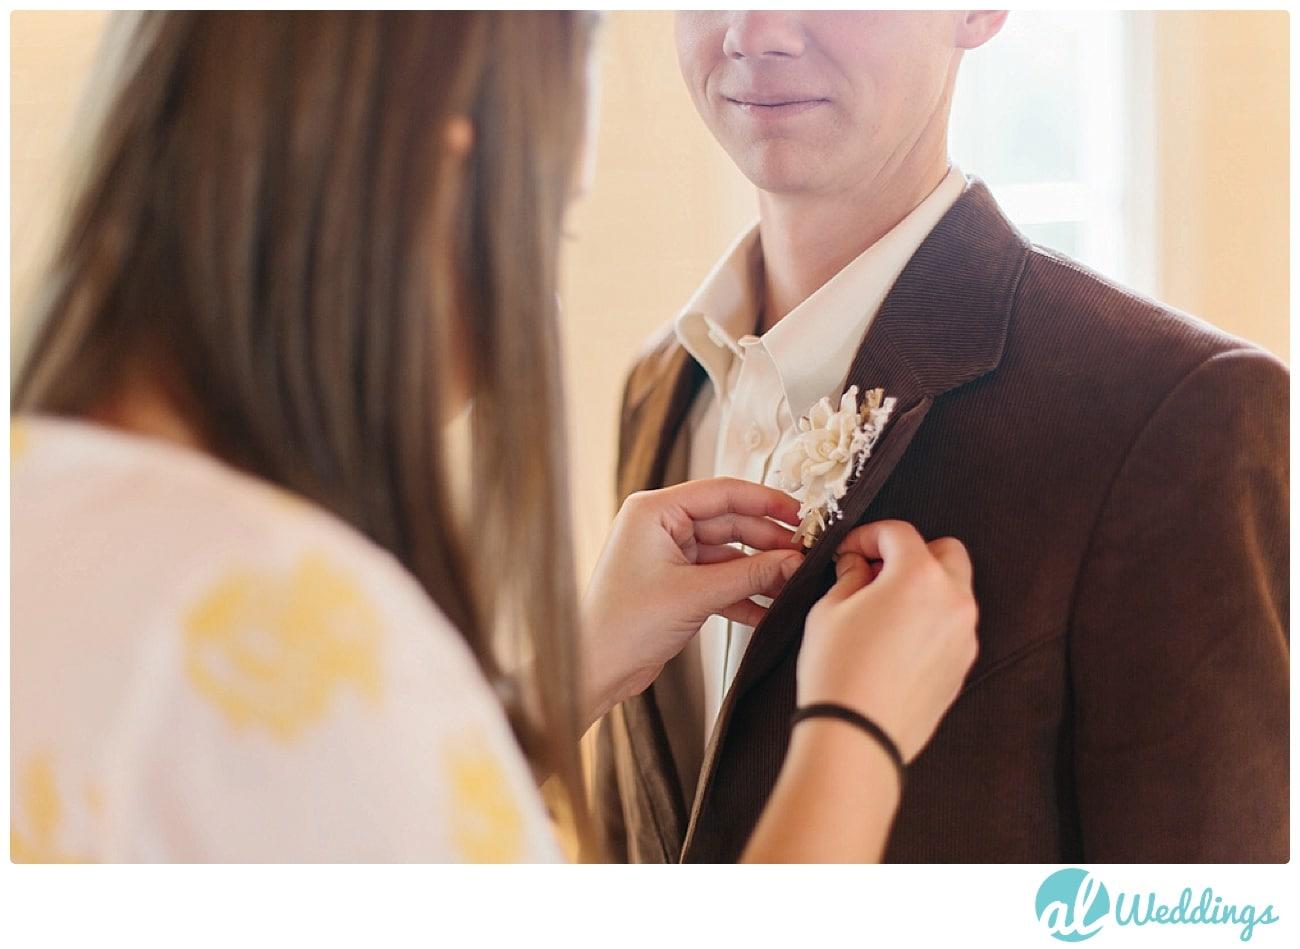 Austin Wedding | Hidden Meadows Vineyard | Alabama Wedding Photographer-22.jpg